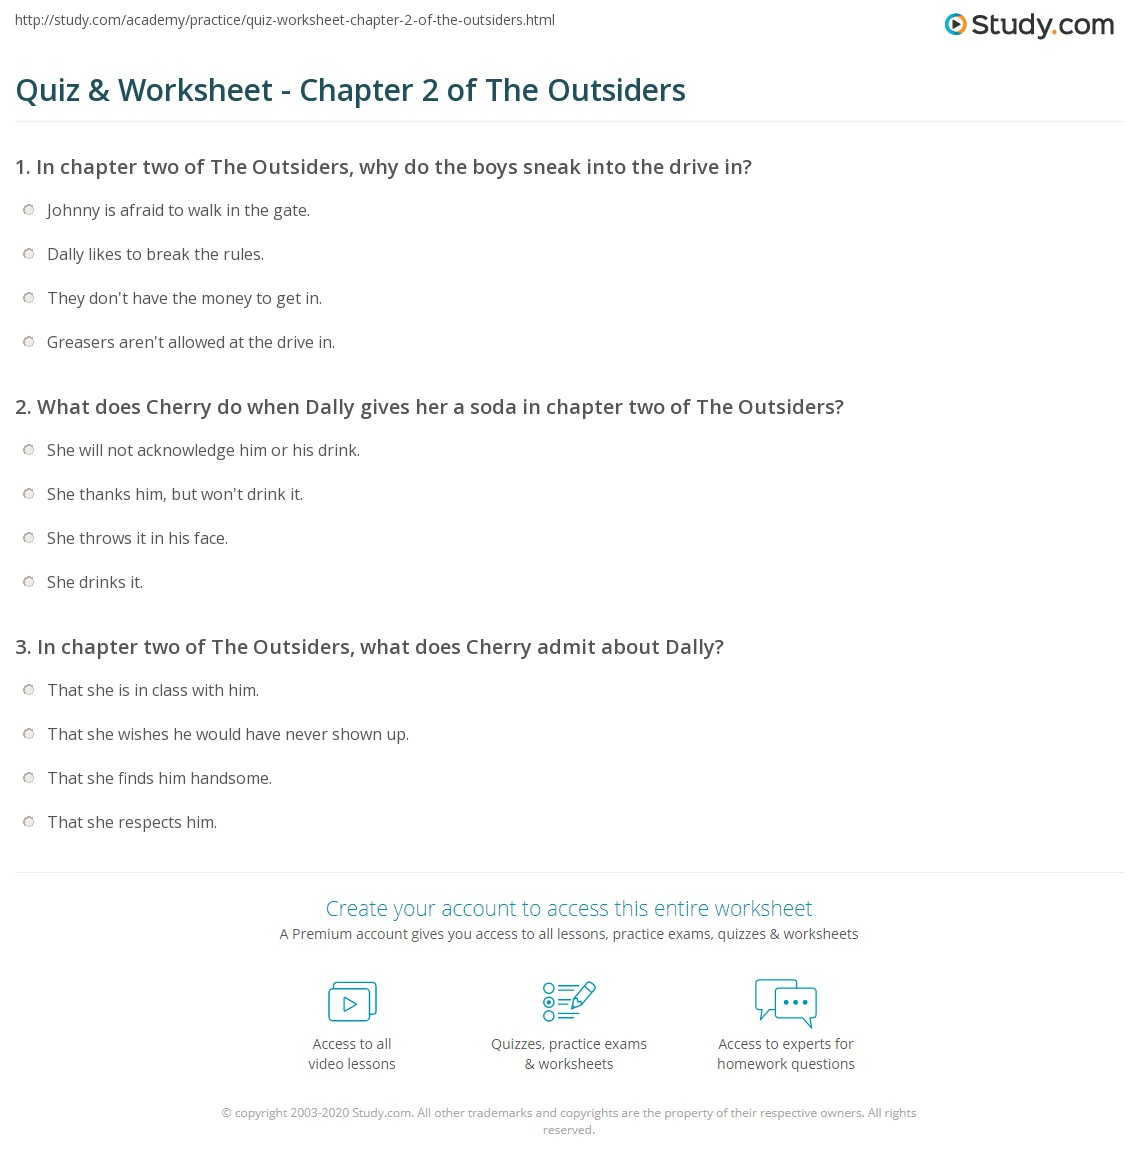 quiz worksheet chapter 2 of the outsiders. Black Bedroom Furniture Sets. Home Design Ideas